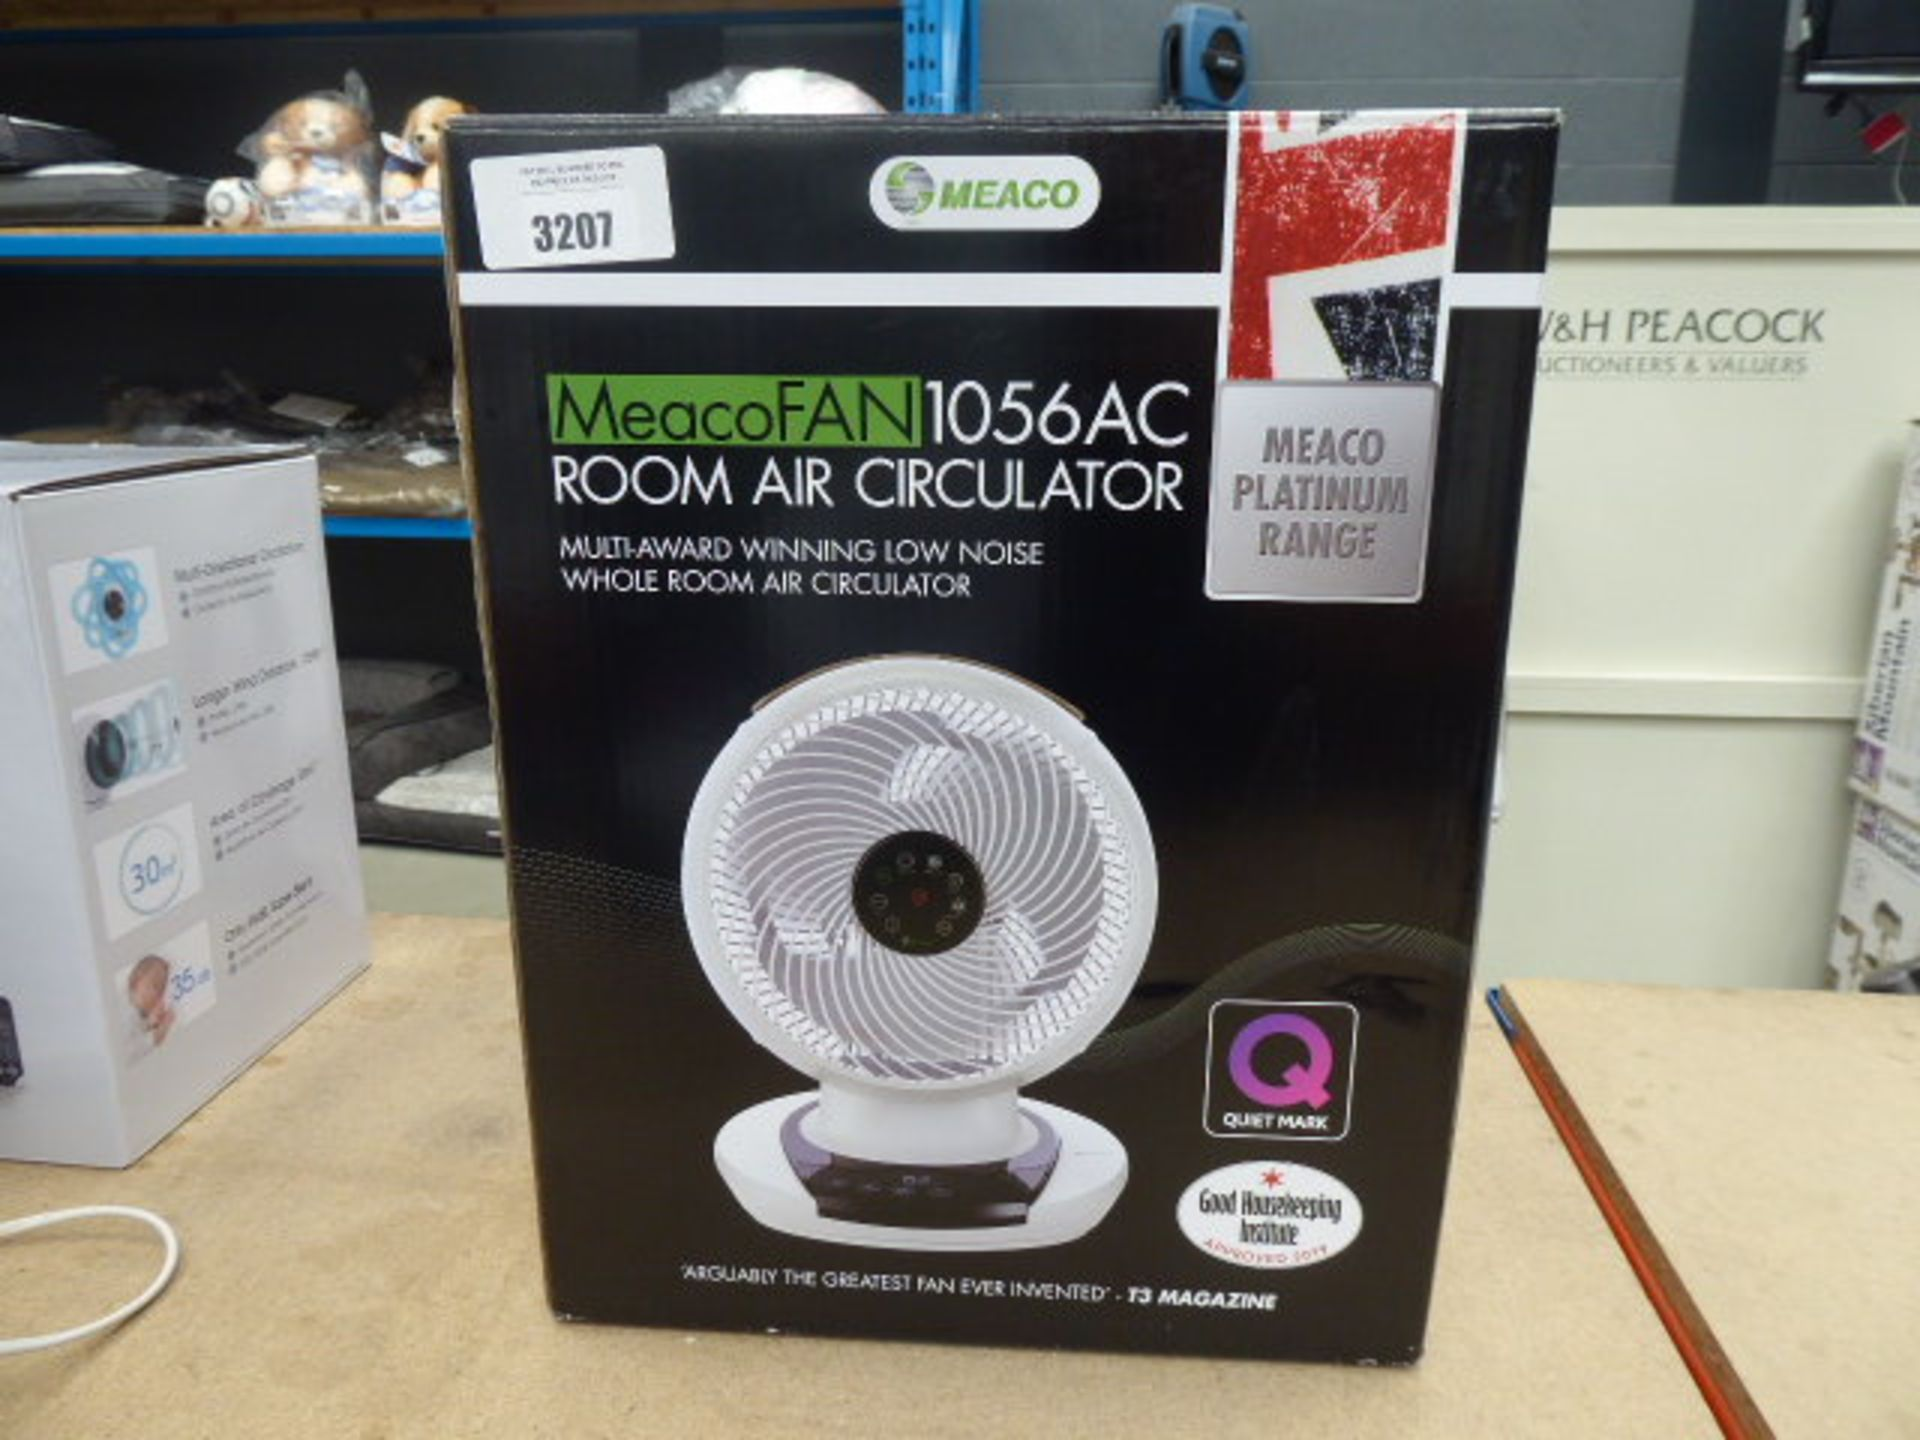 Lot 3207 - Room air circulator fan